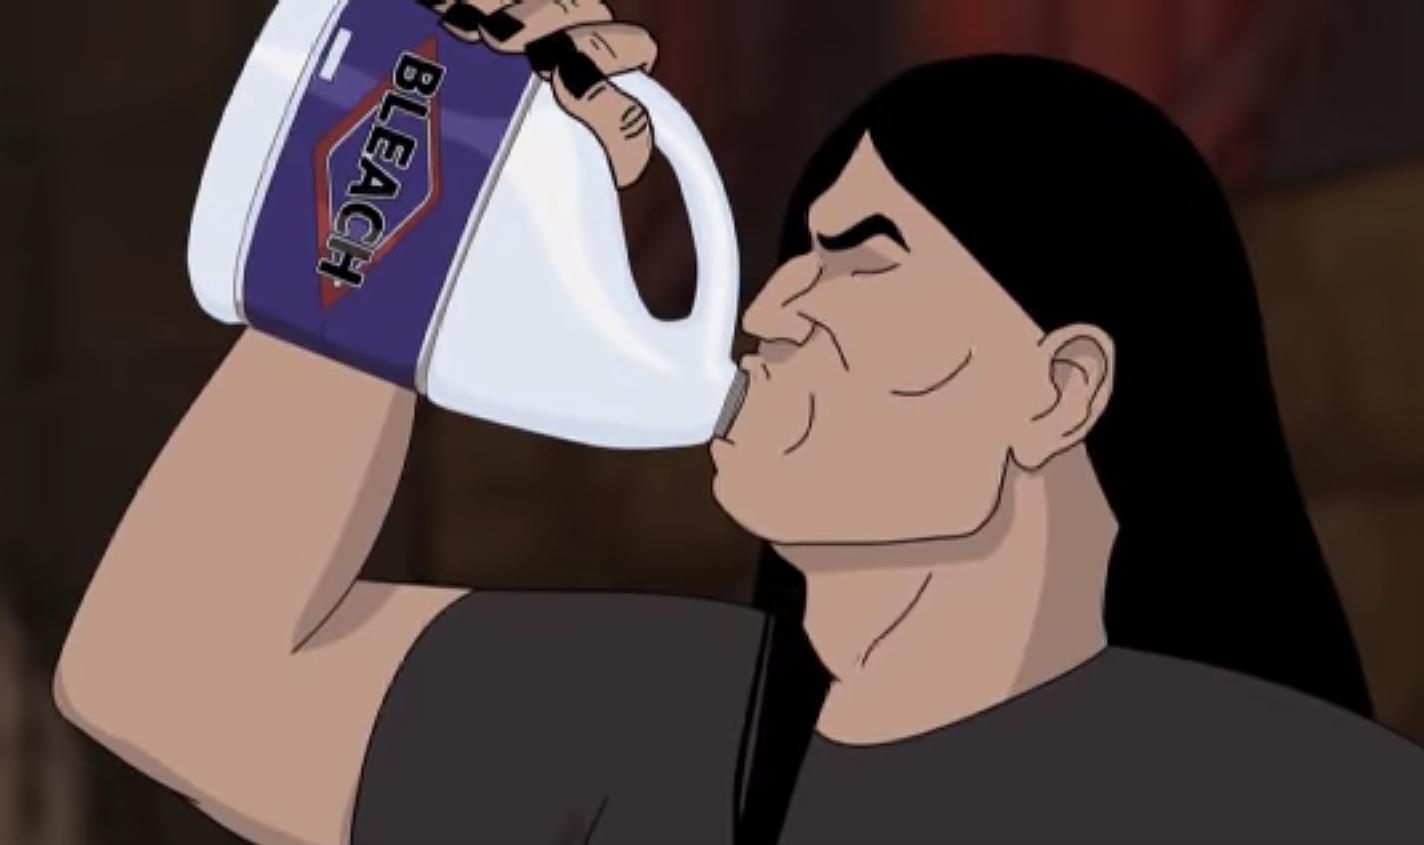 Will drinking bleach kill you